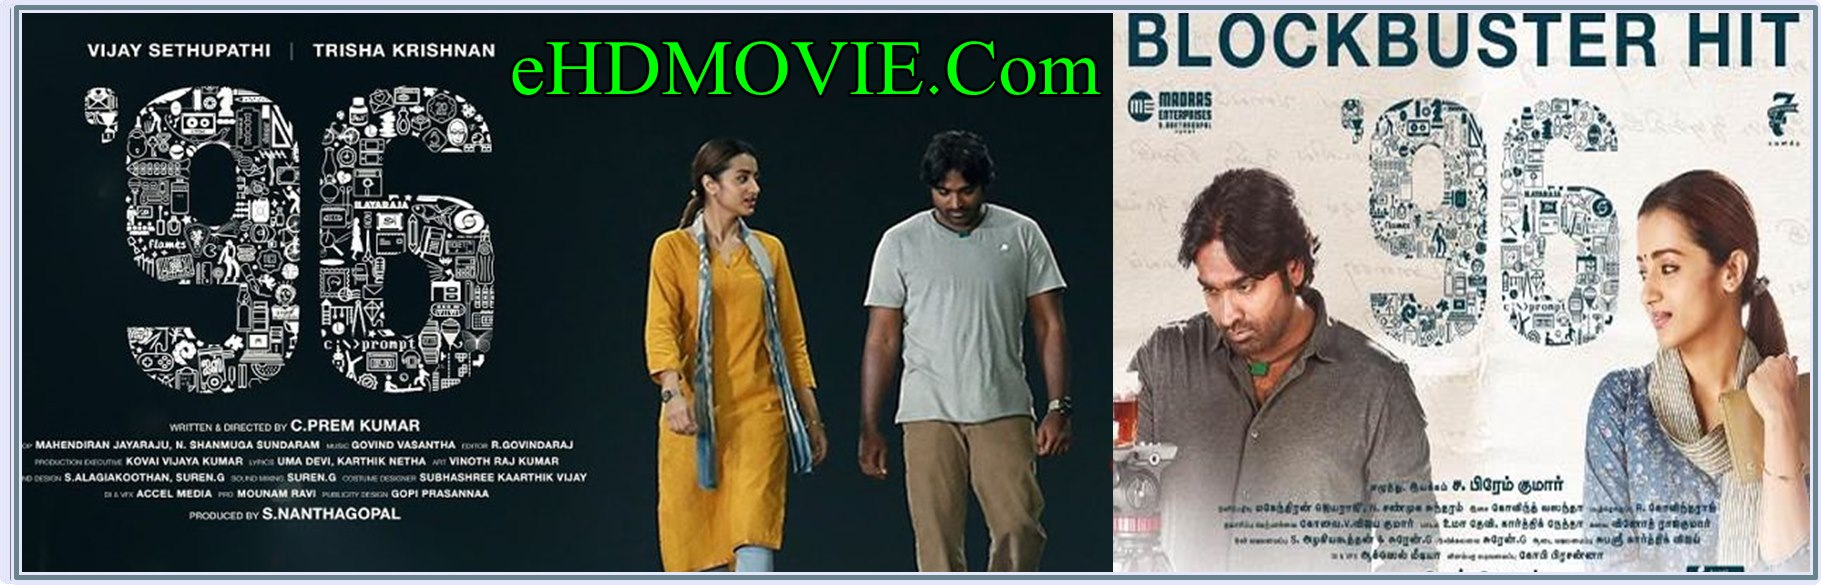 96 2018 Full Movie Tamil 720p - HEVC - 480p ORG HDRip 400MB - 700MB - 1.4GB ESubs Free Download